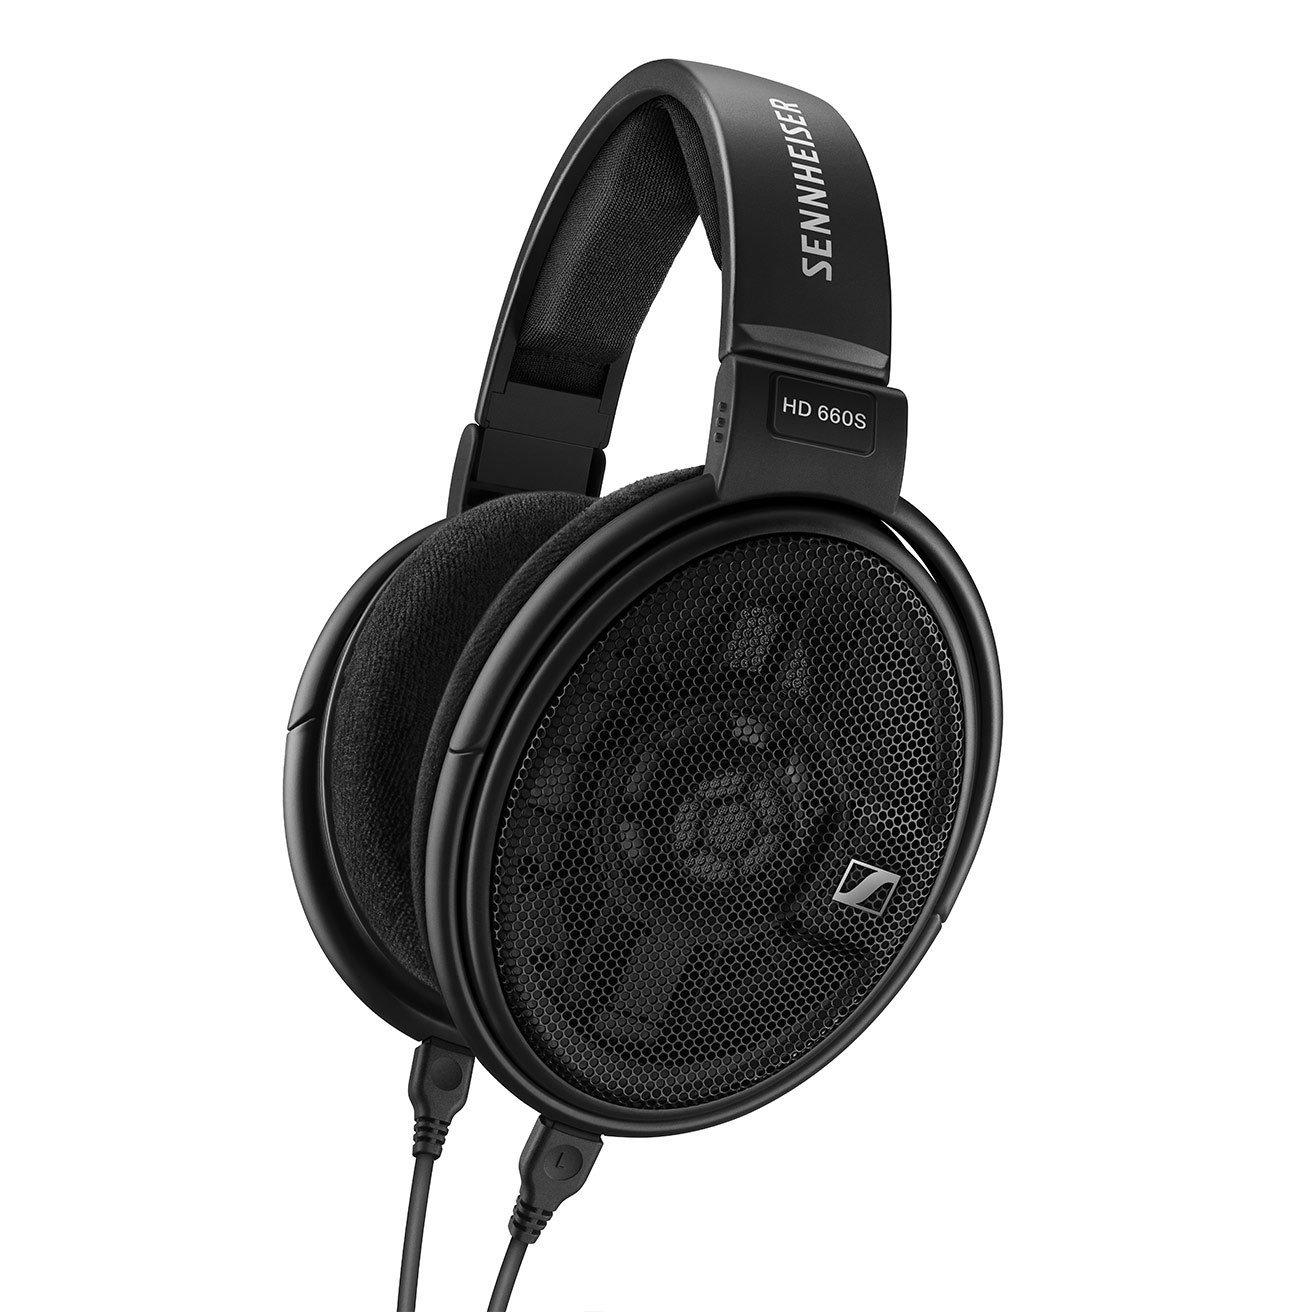 Sennheiser HD 660 S Open, Dynamic Headphones for Audiophiles £309 @ Amazon